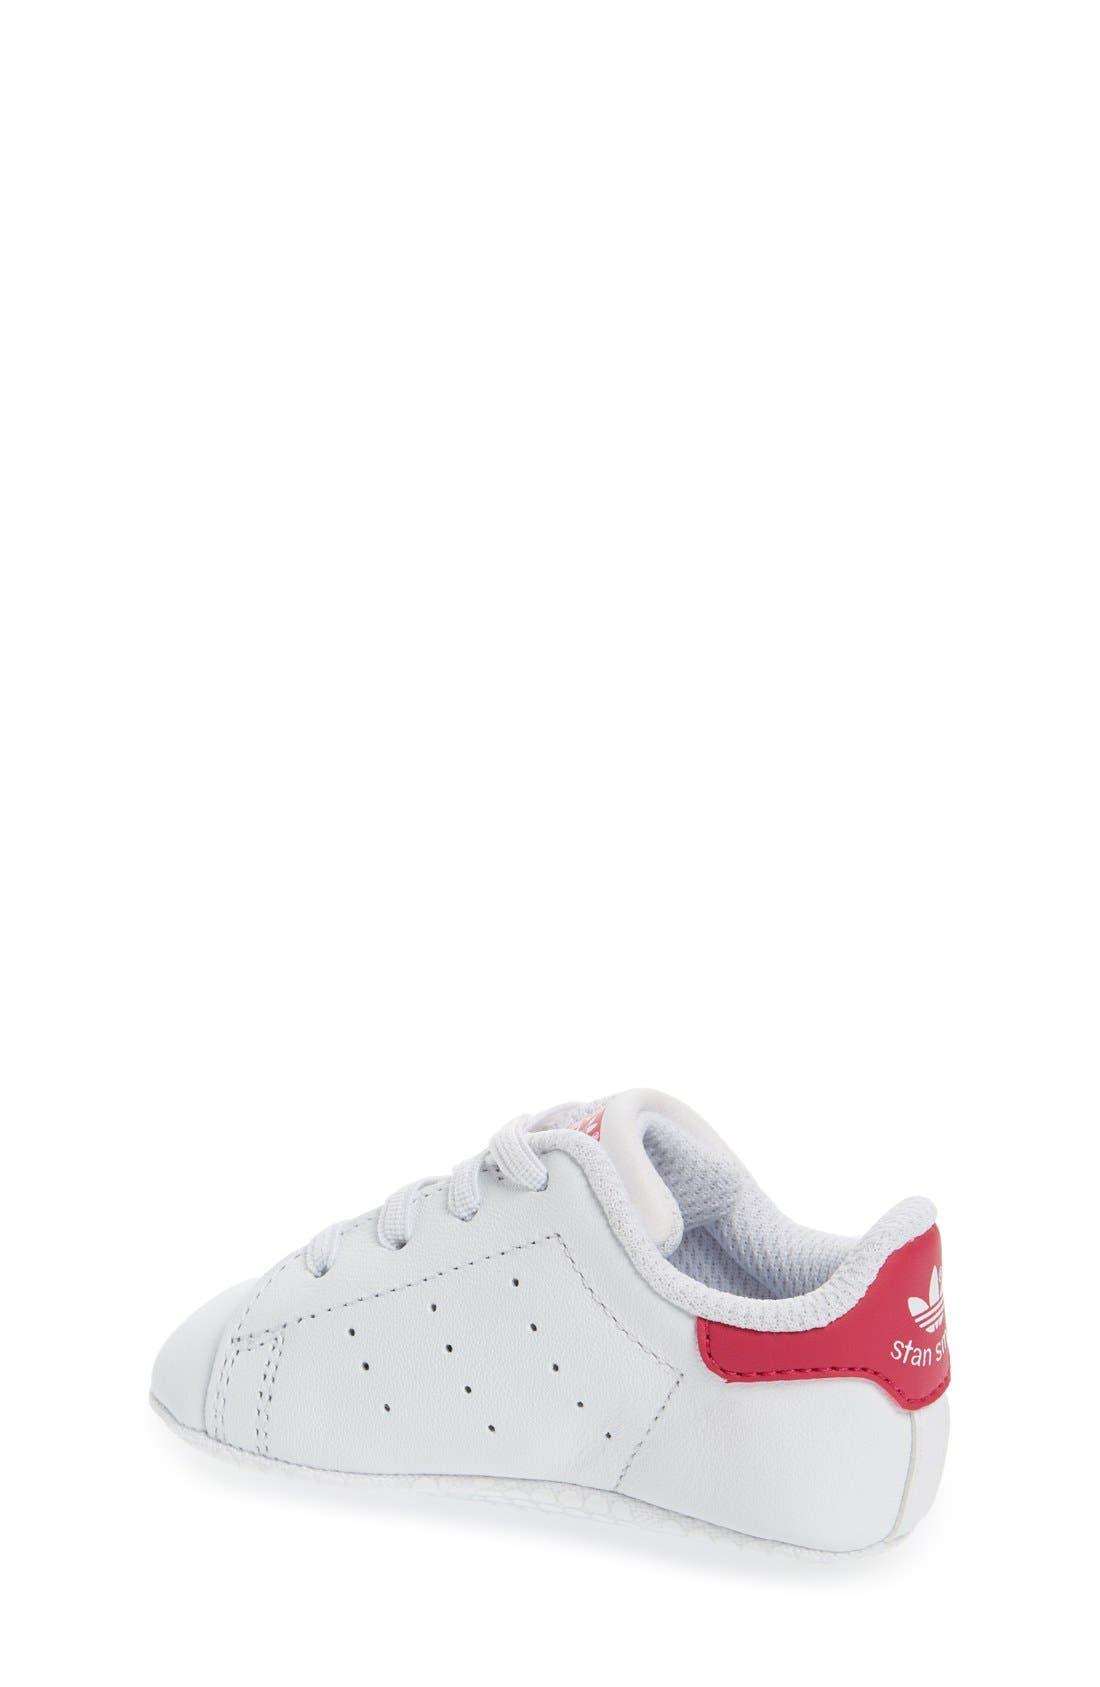 'Stan Smith' Crib Sneaker,                             Alternate thumbnail 2, color,                             100